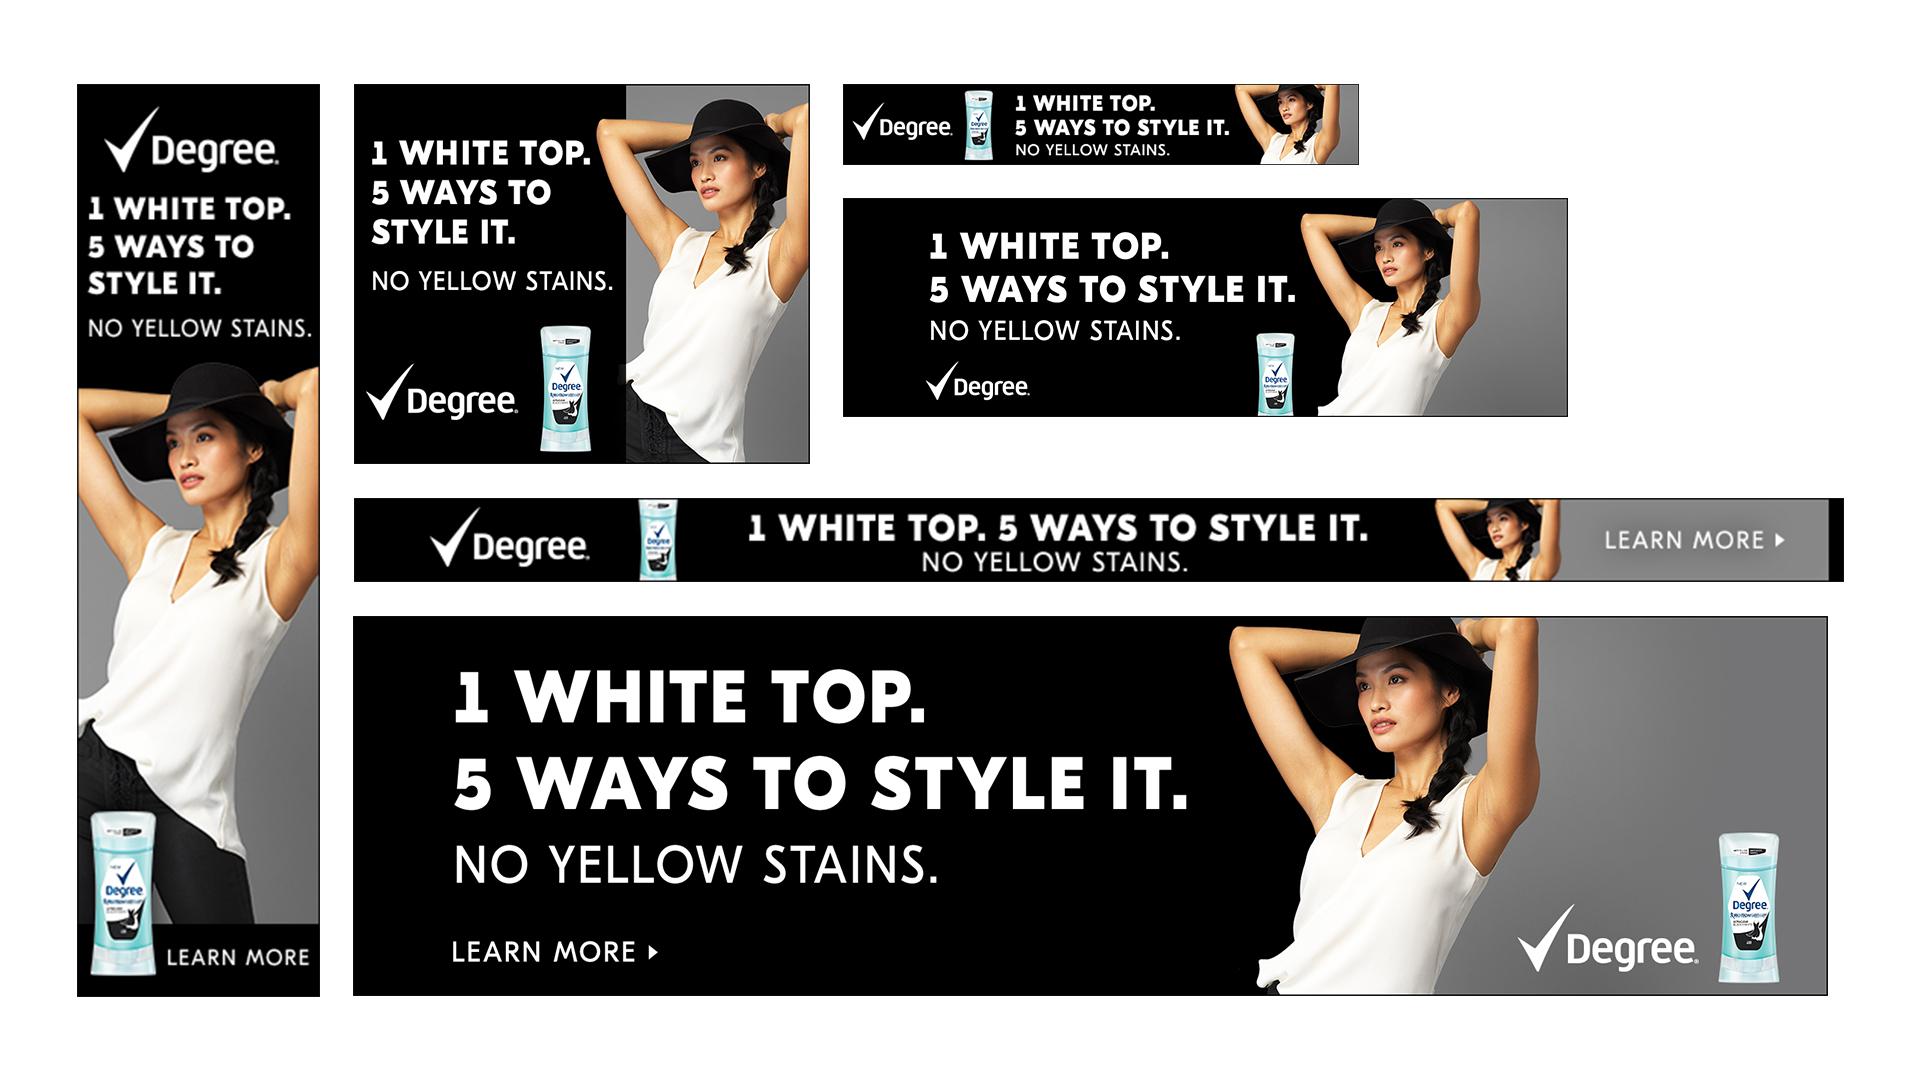 Media banners on Amazon Advertising Platform, Digital, White Top Version